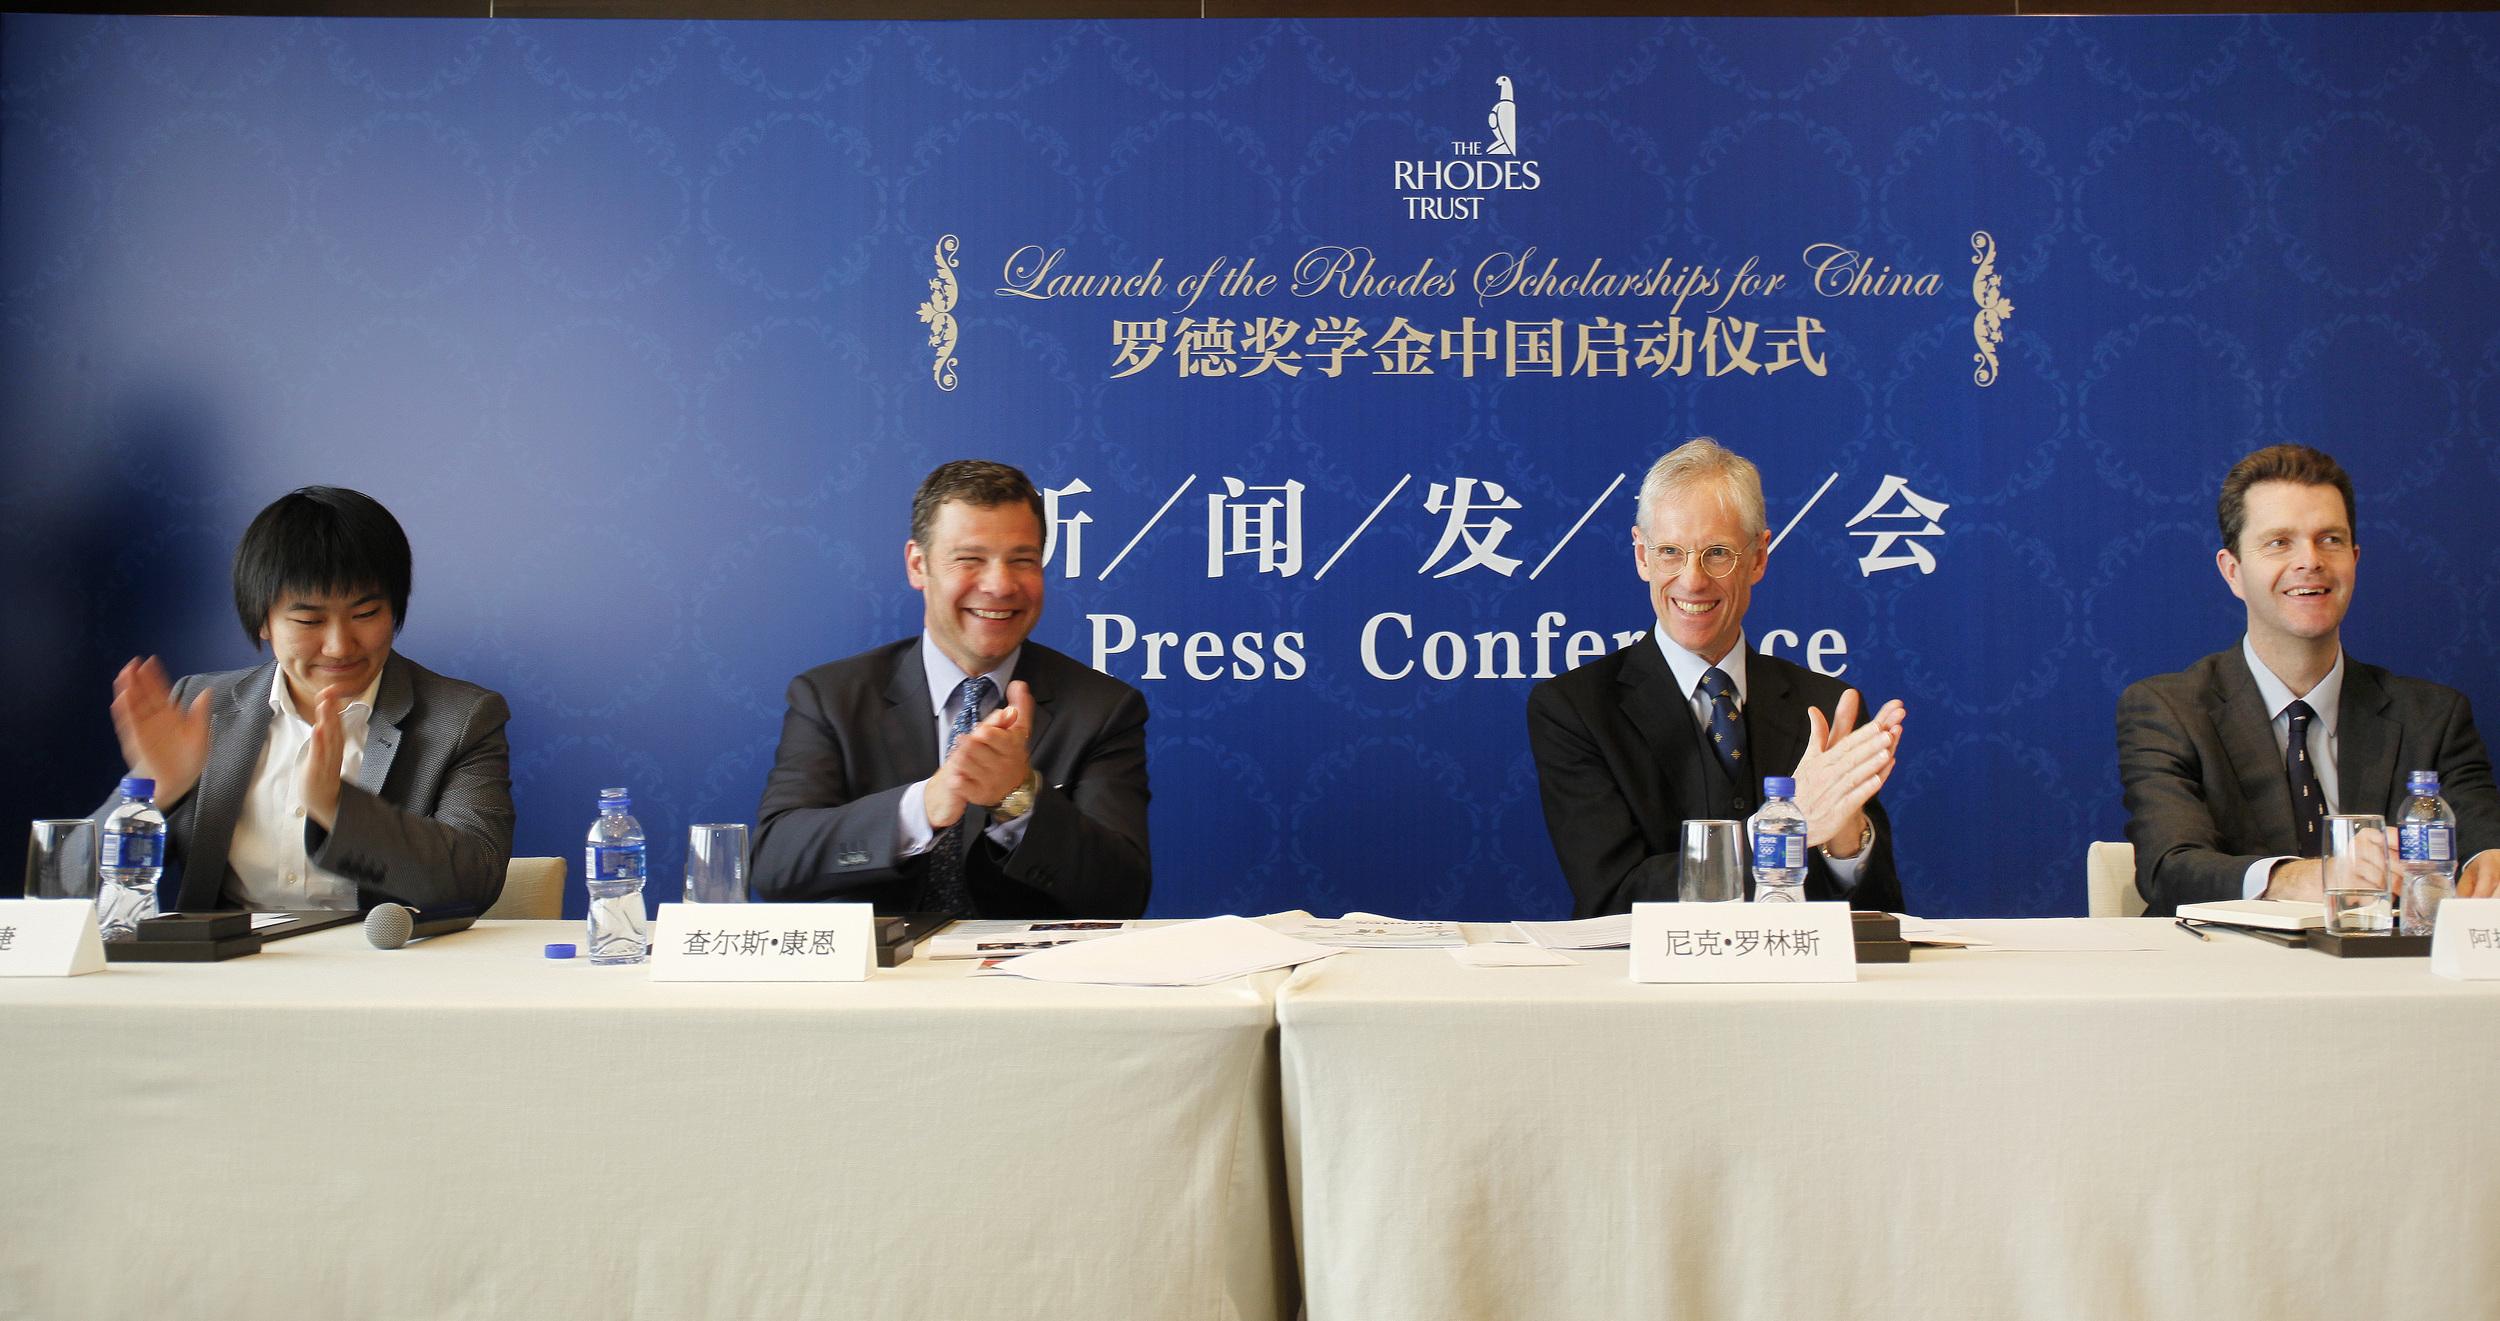 Harvard Club of Shanghai Board memberMeijie Tang, AB '09 (far left) at the press conference